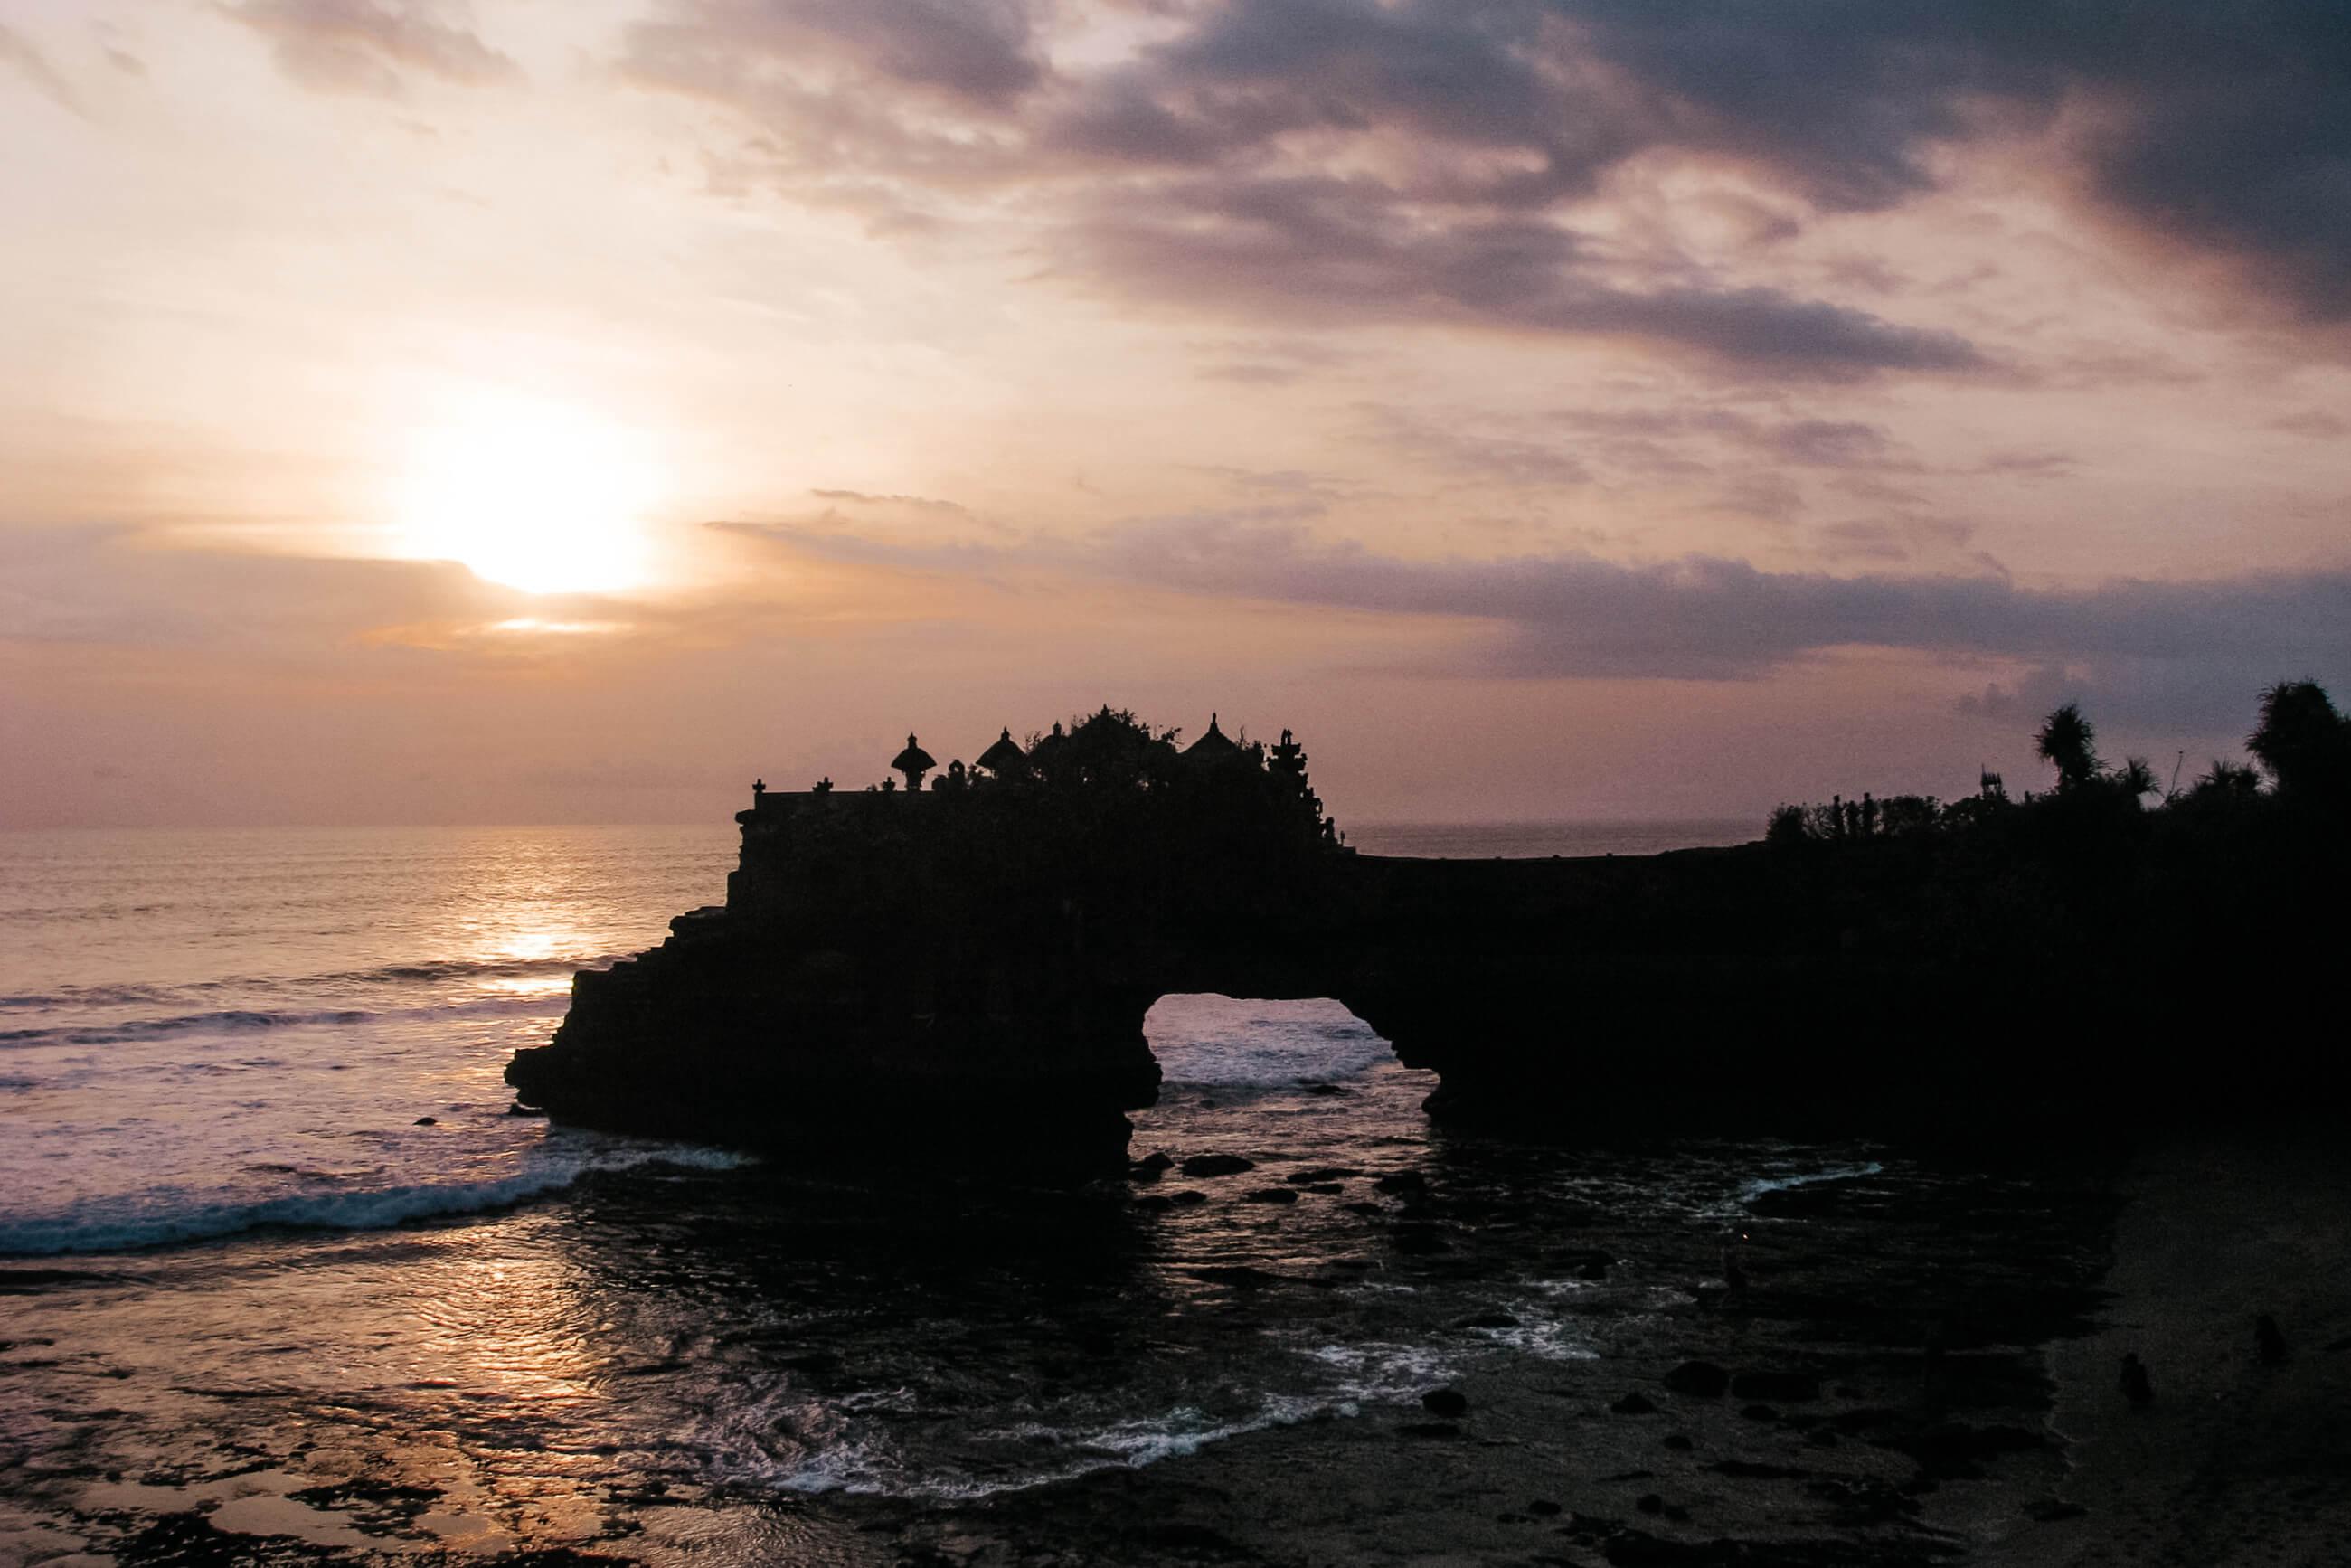 https://bubo.sk/uploads/galleries/7417/jozefharvanek_indonezia_bali_316-chram-tanah-lot-27.jpg